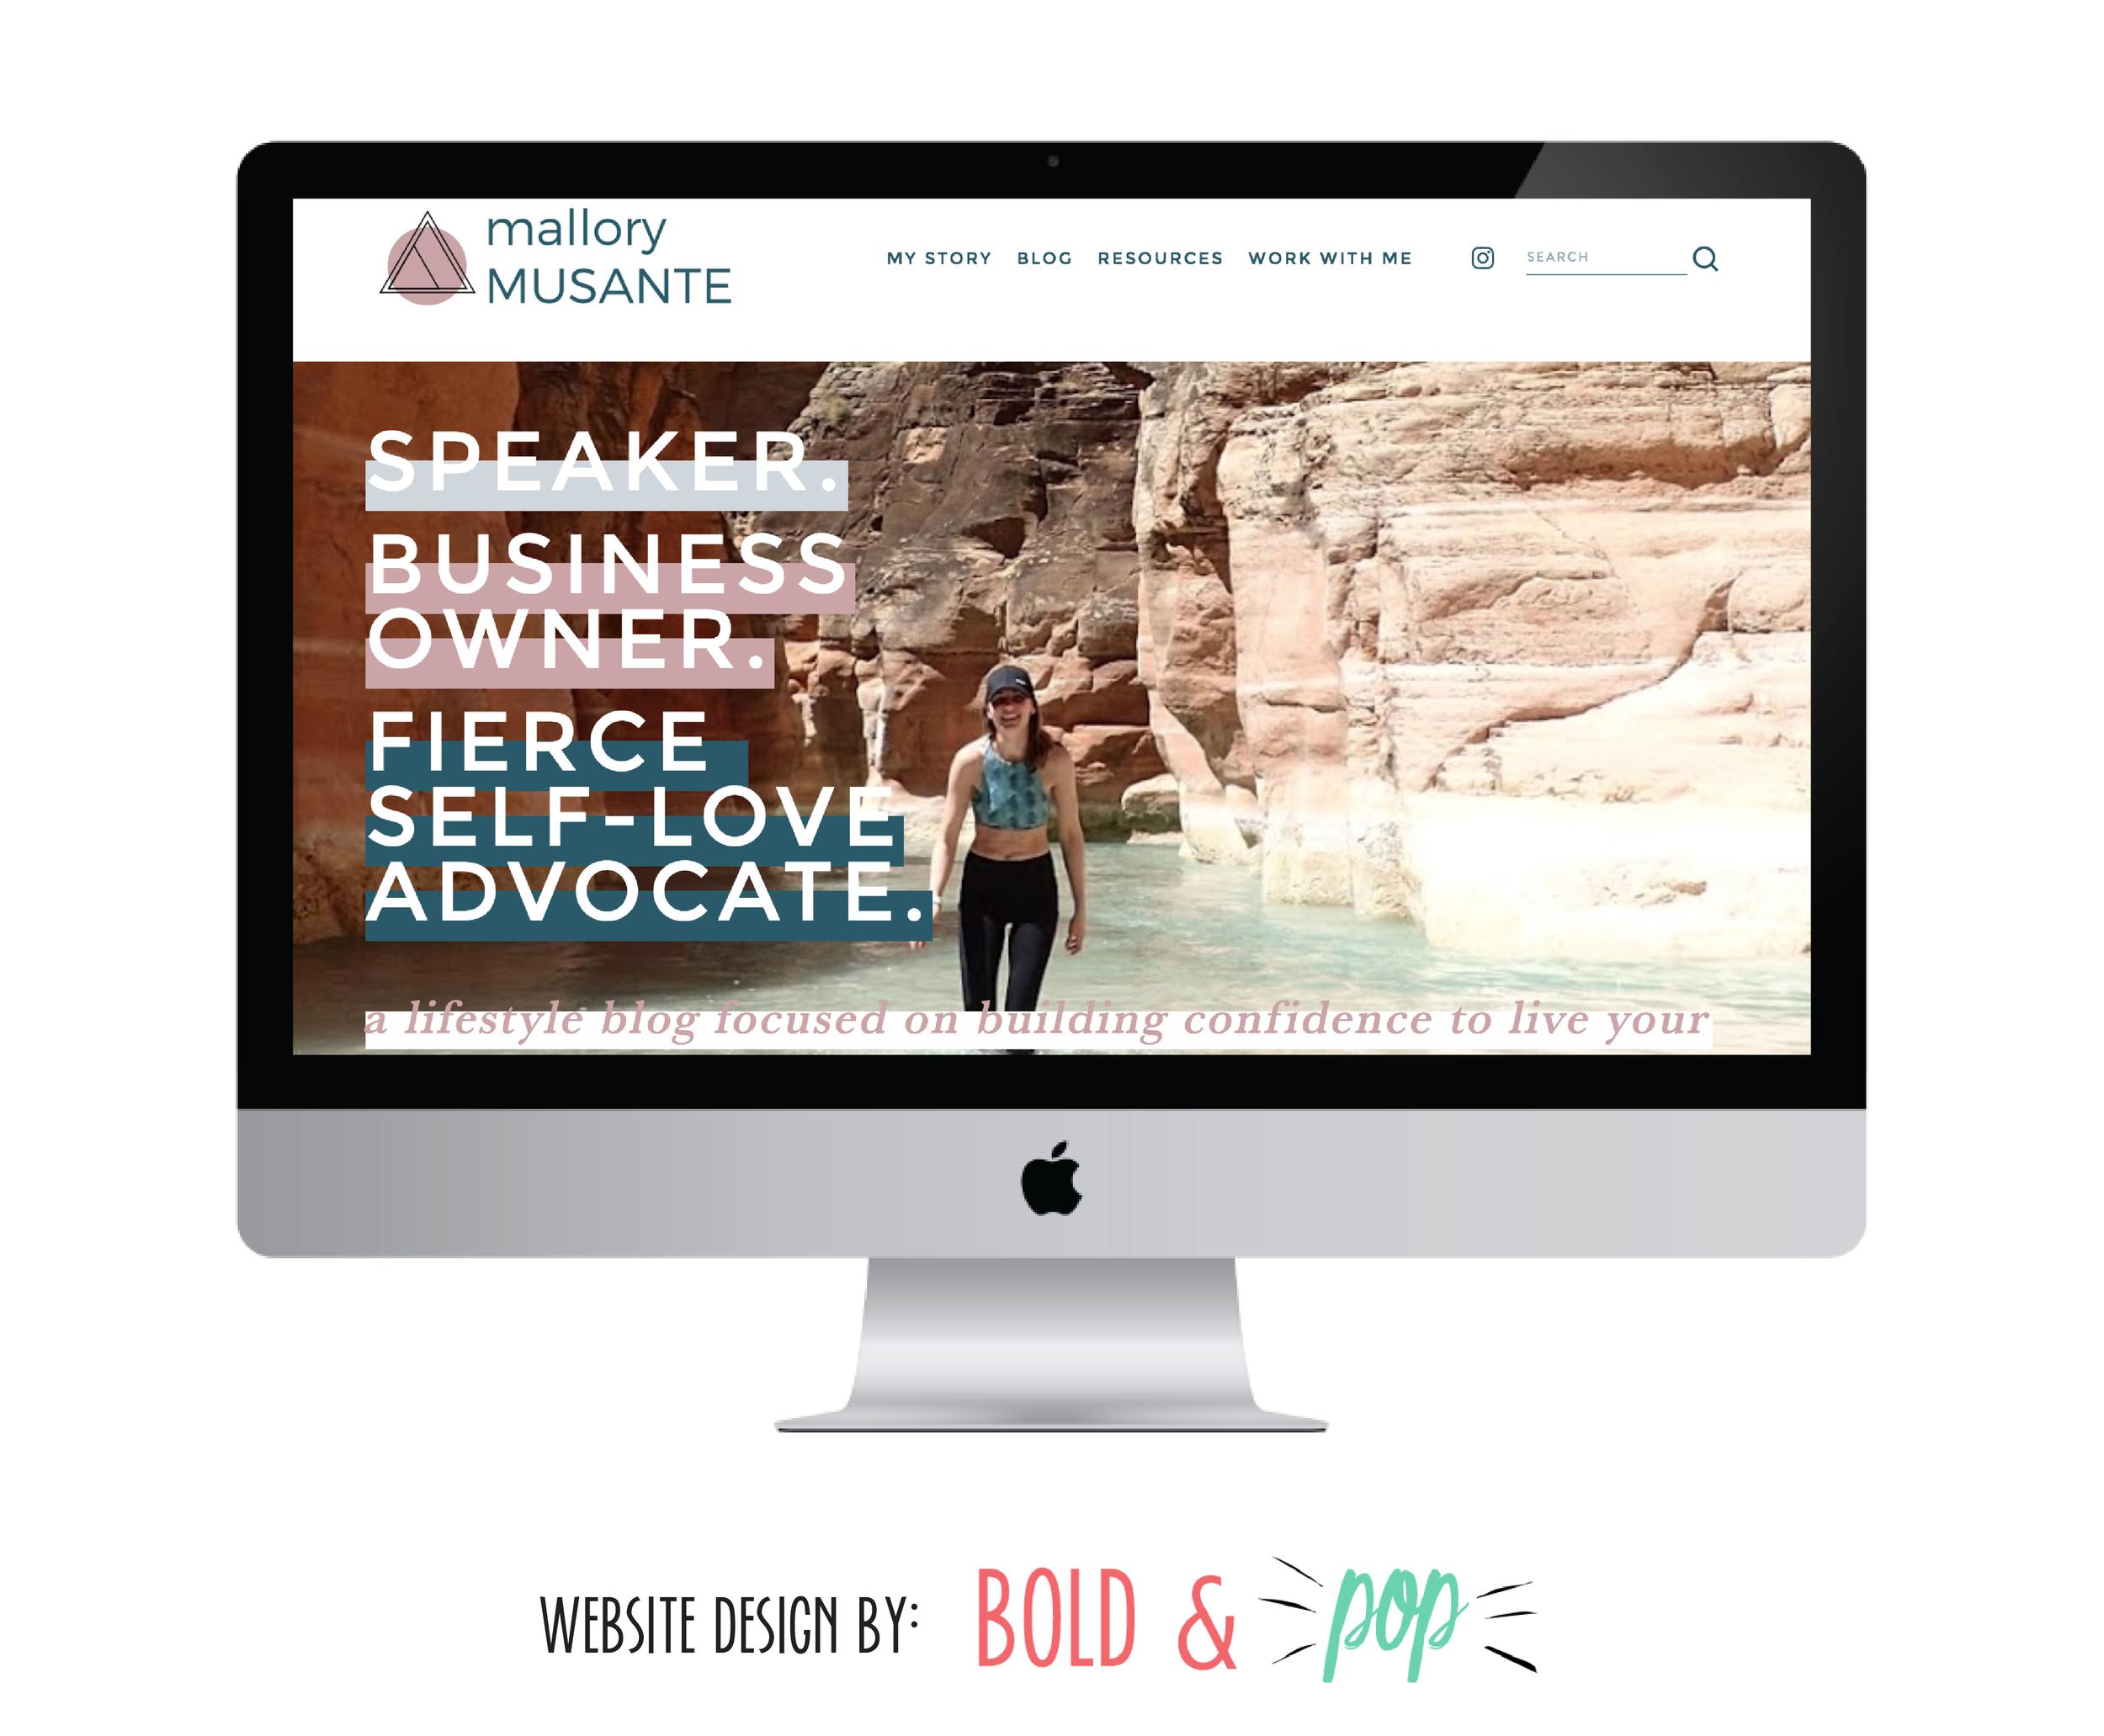 Bold & Pop : Mallory Musante Branding & Squarespace Website Design